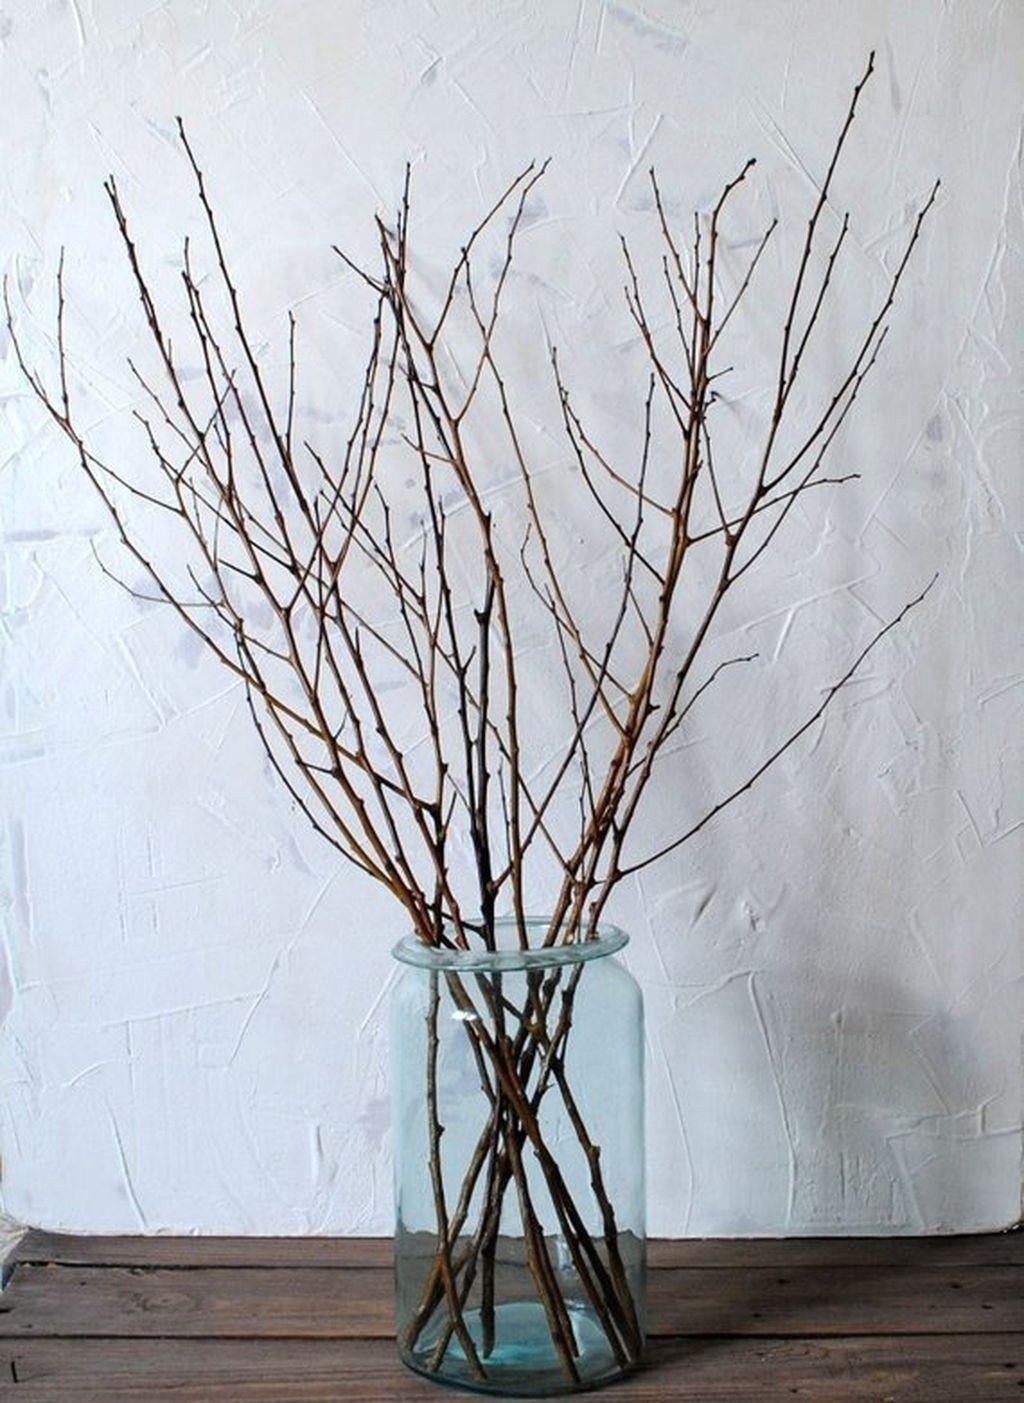 76 Amazing Branches Dried Tree Decor Ideas Home Decor Diy Design Vase Branches Decor Dry Tree Twigs Decor